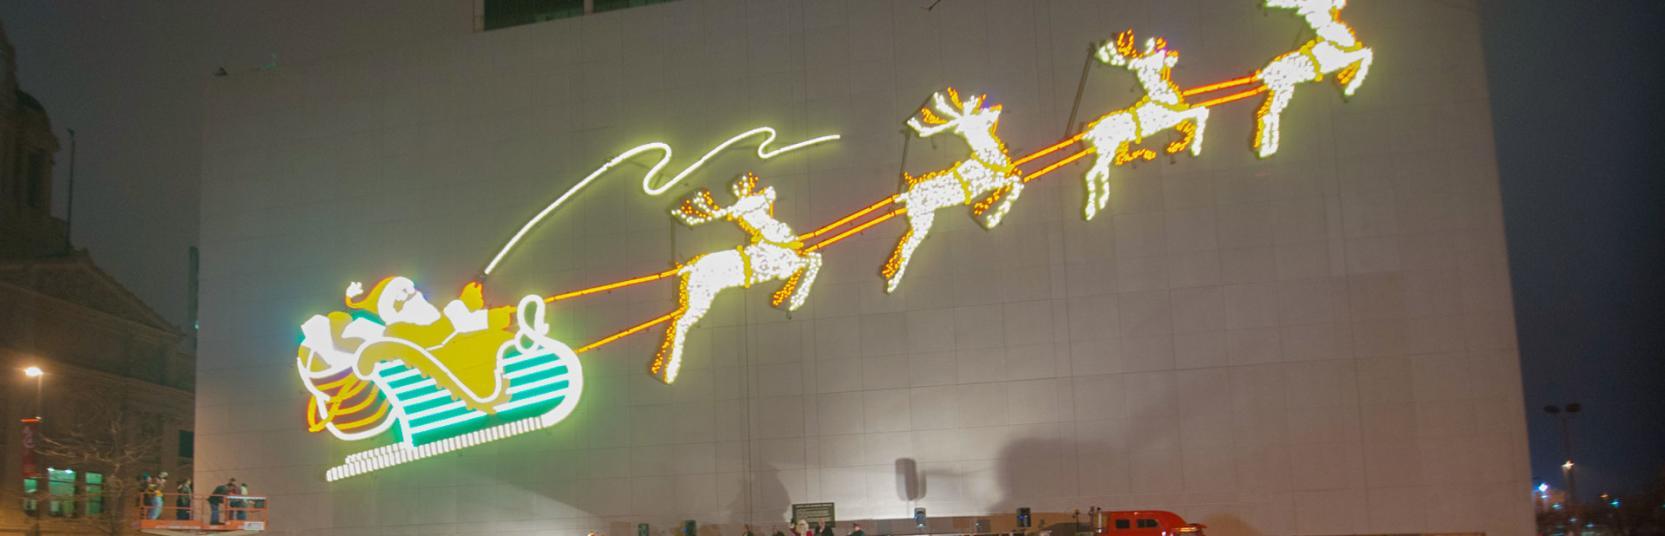 Fort Wayne Holiday Tradition - Night of Lights